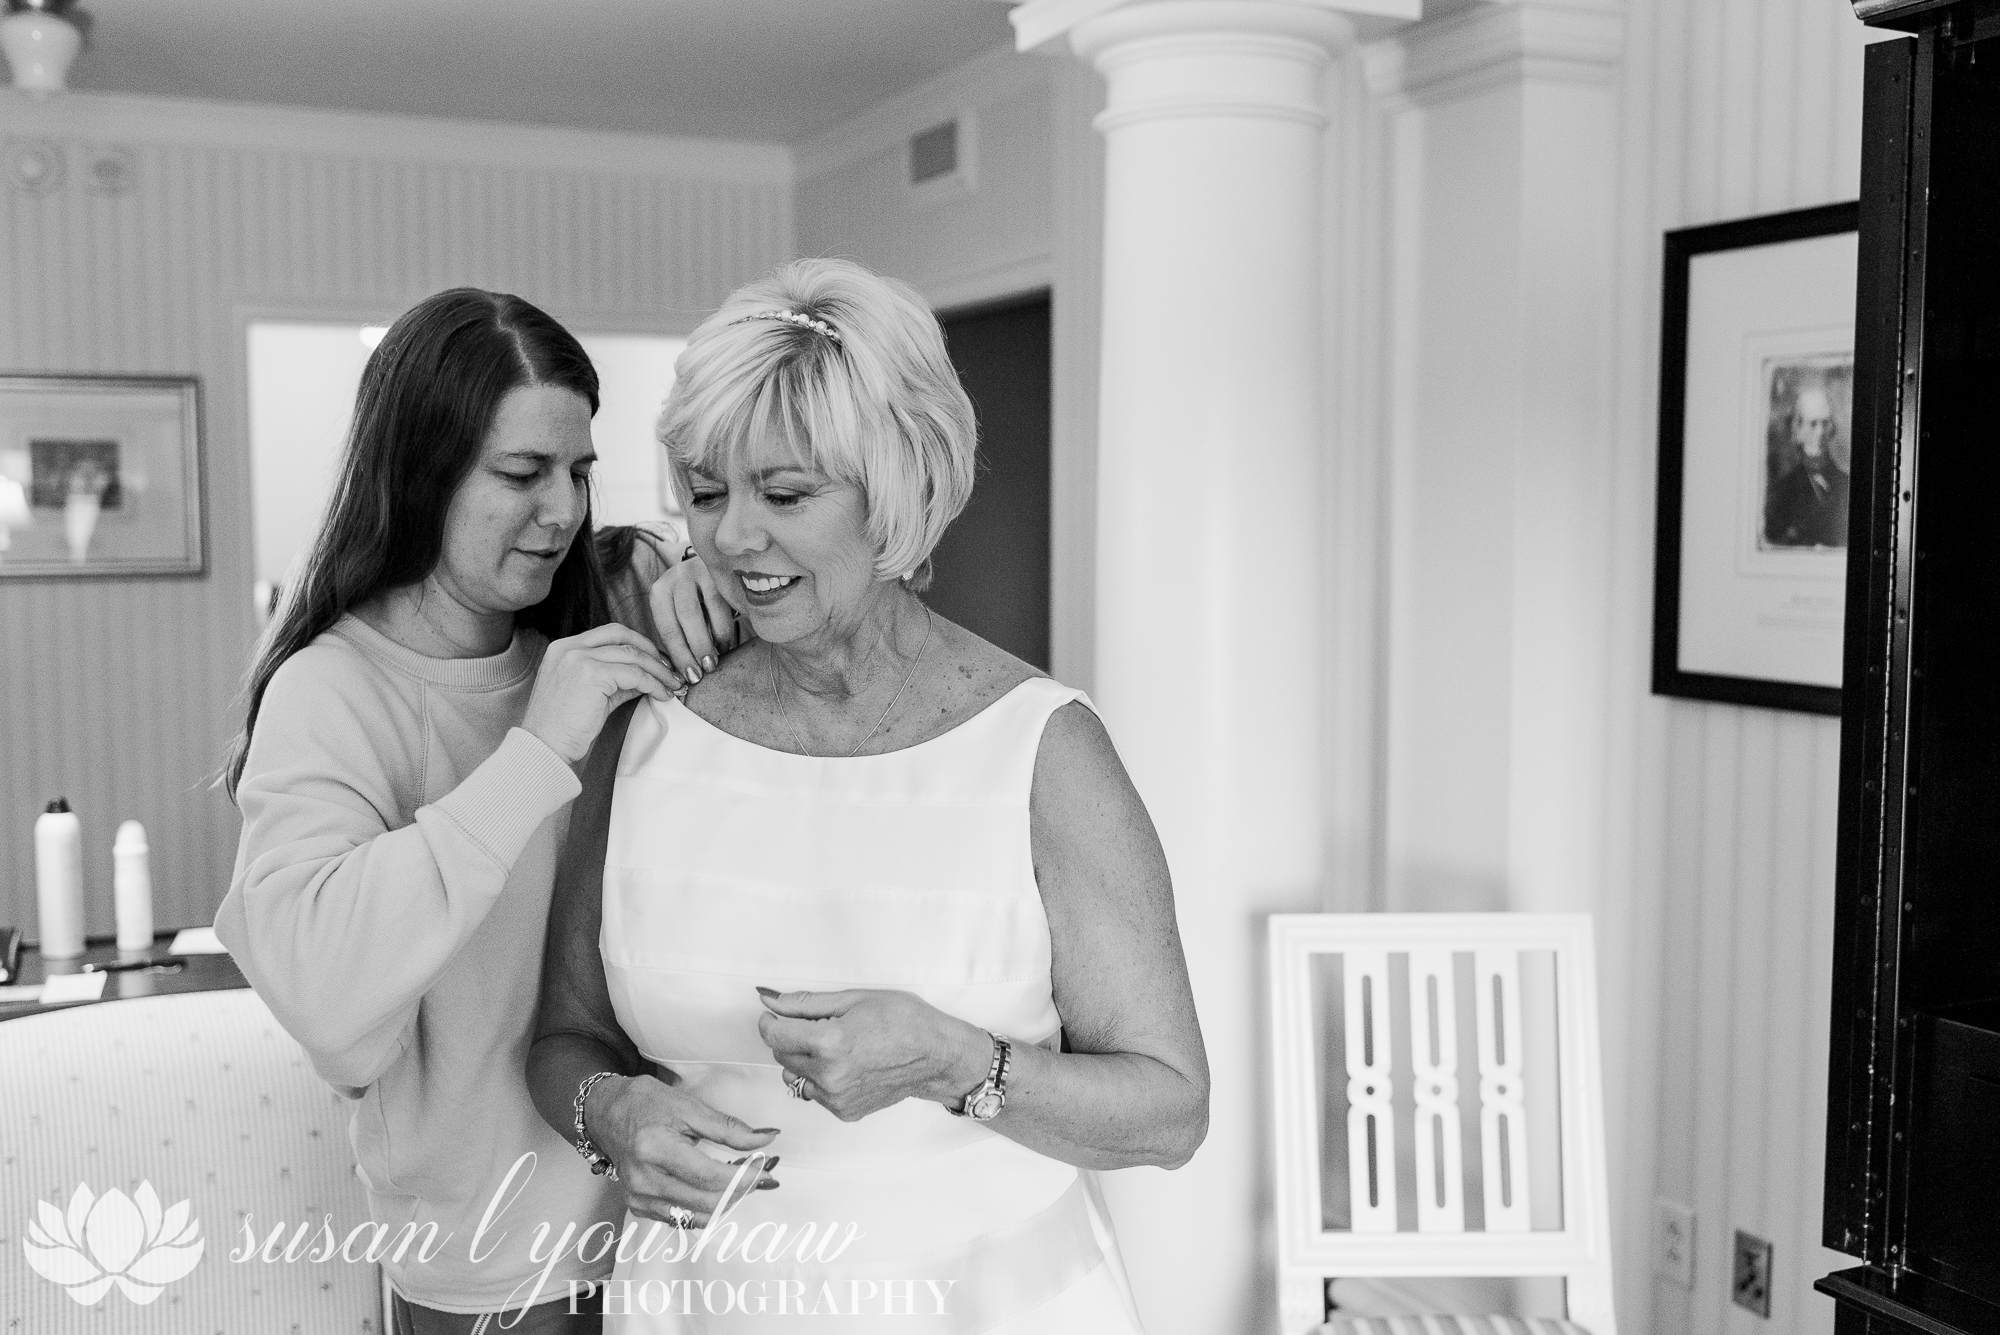 BLOG Carolyn Adams and Jim McCune 07-04-2018 SLY Photography-2.jpg